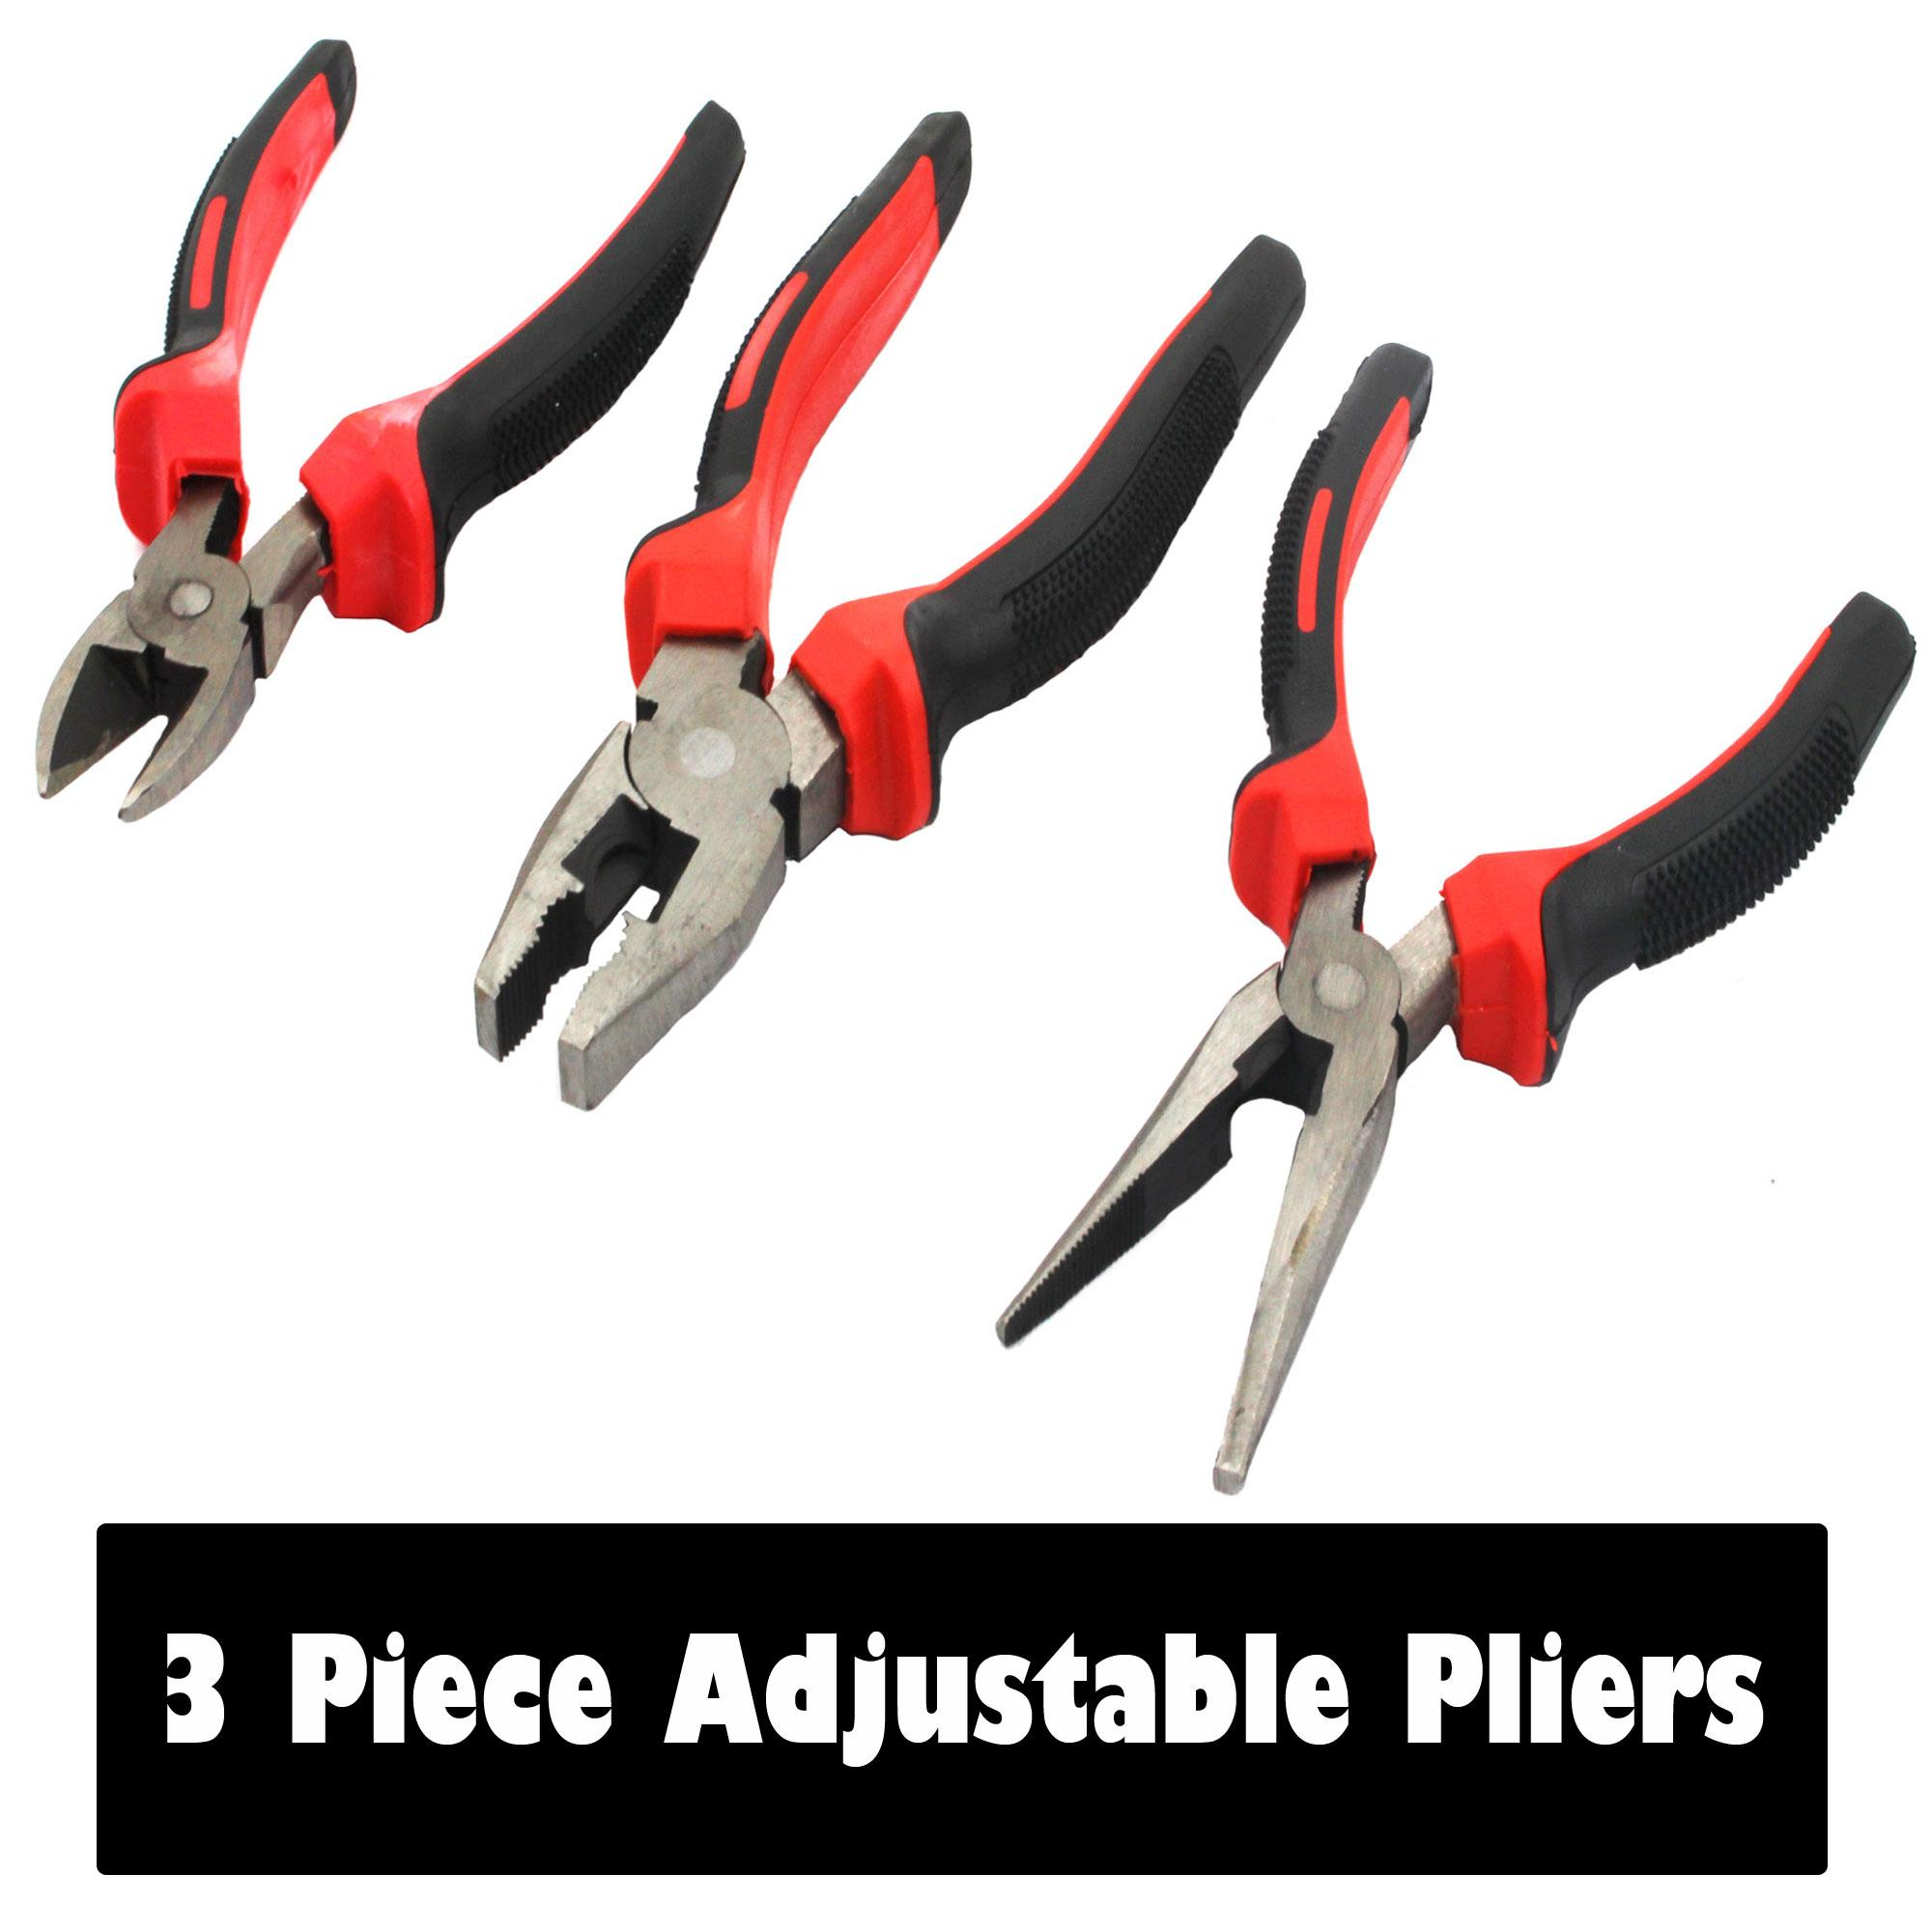 3-Piece Adjustable Pliers Set (Black/red)